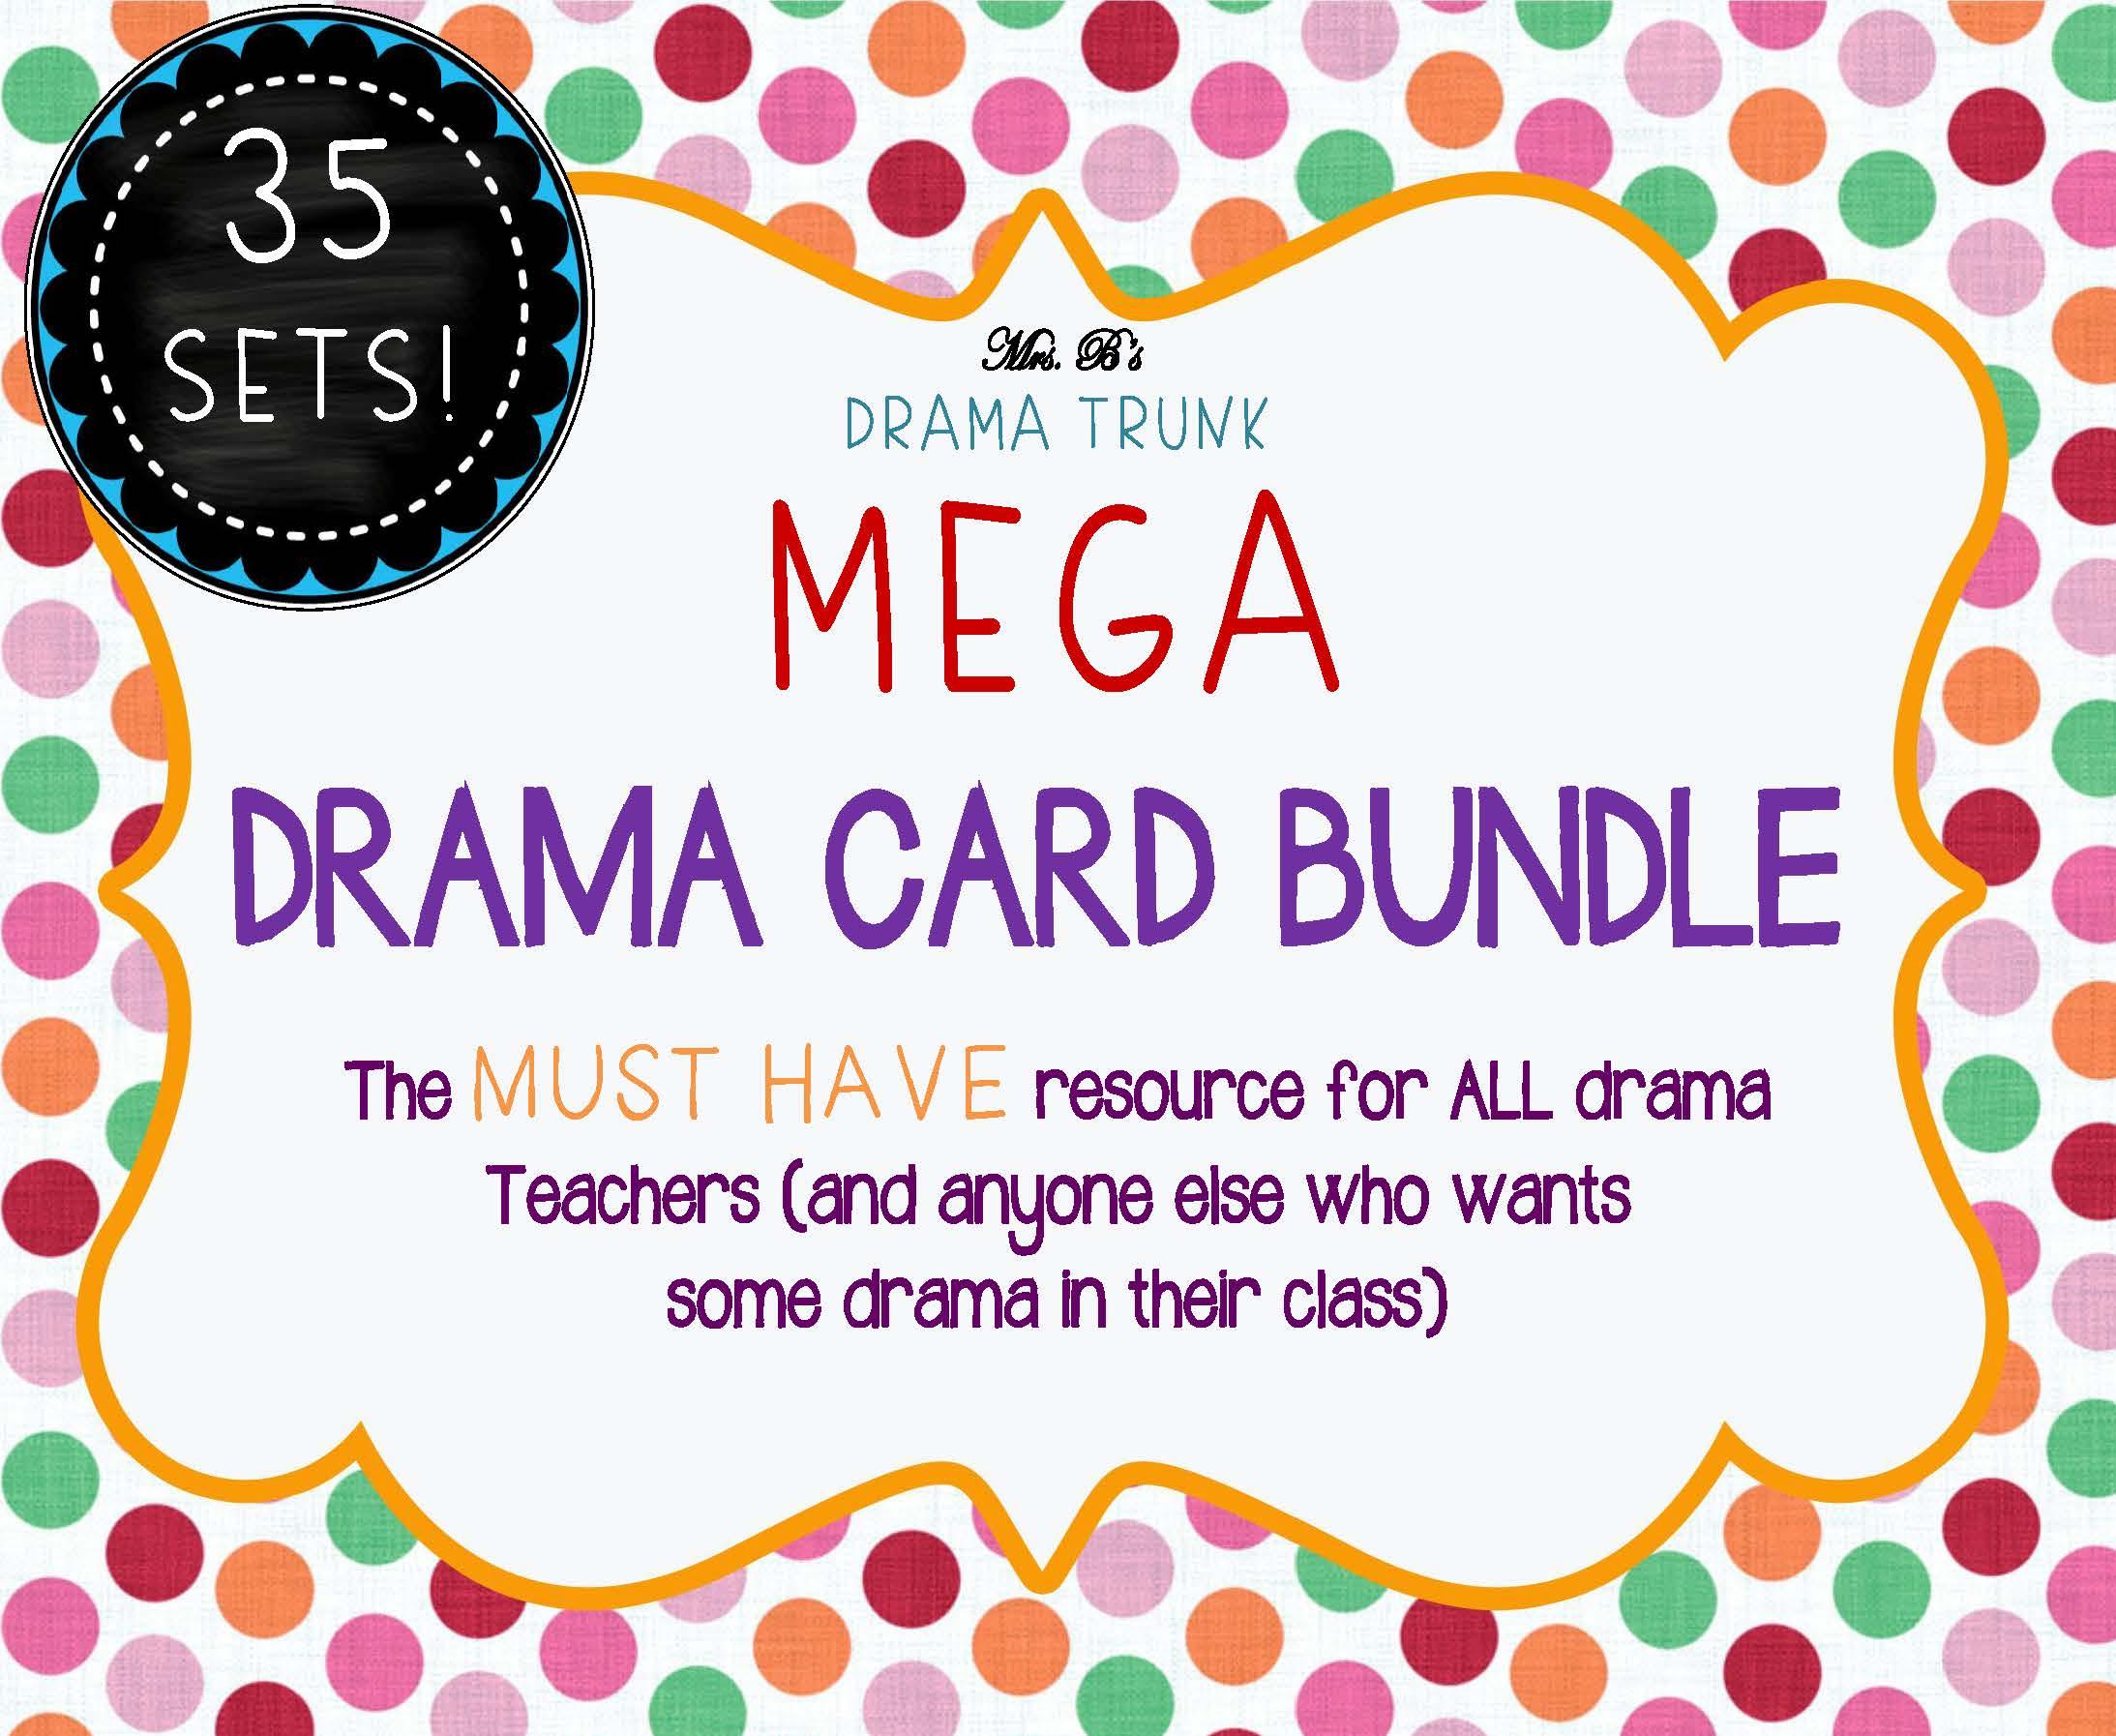 MEGA DRAMA CARD BUNDLE with Drama Activities by DRAMA TRUNK